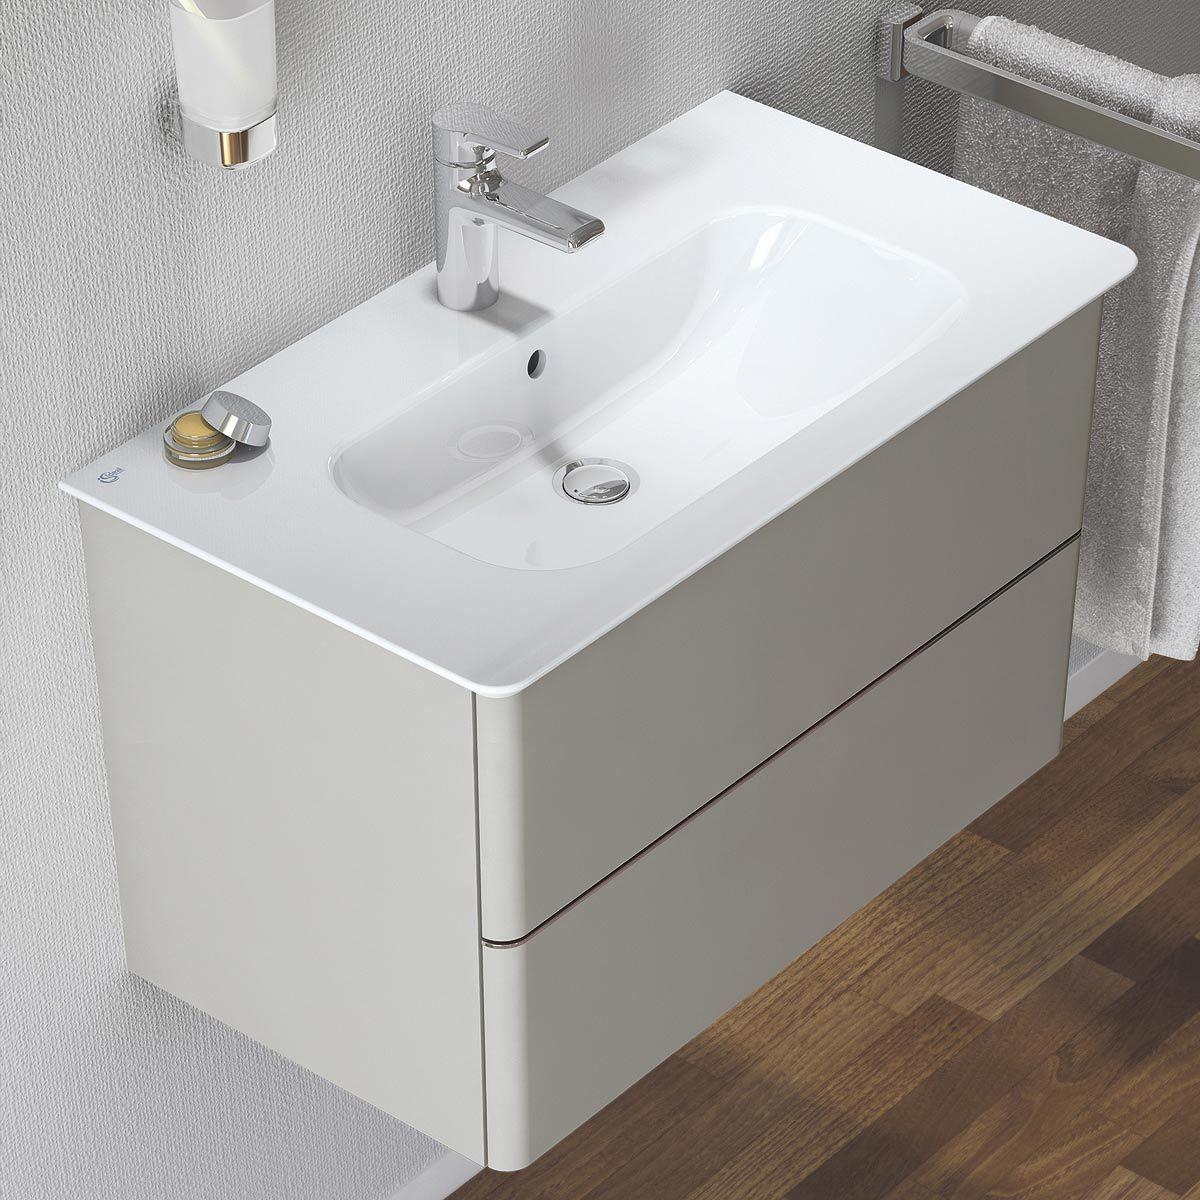 magasin aubade salle de bain meuble de salle bain bois massif espace aubade with magasin aubade. Black Bedroom Furniture Sets. Home Design Ideas